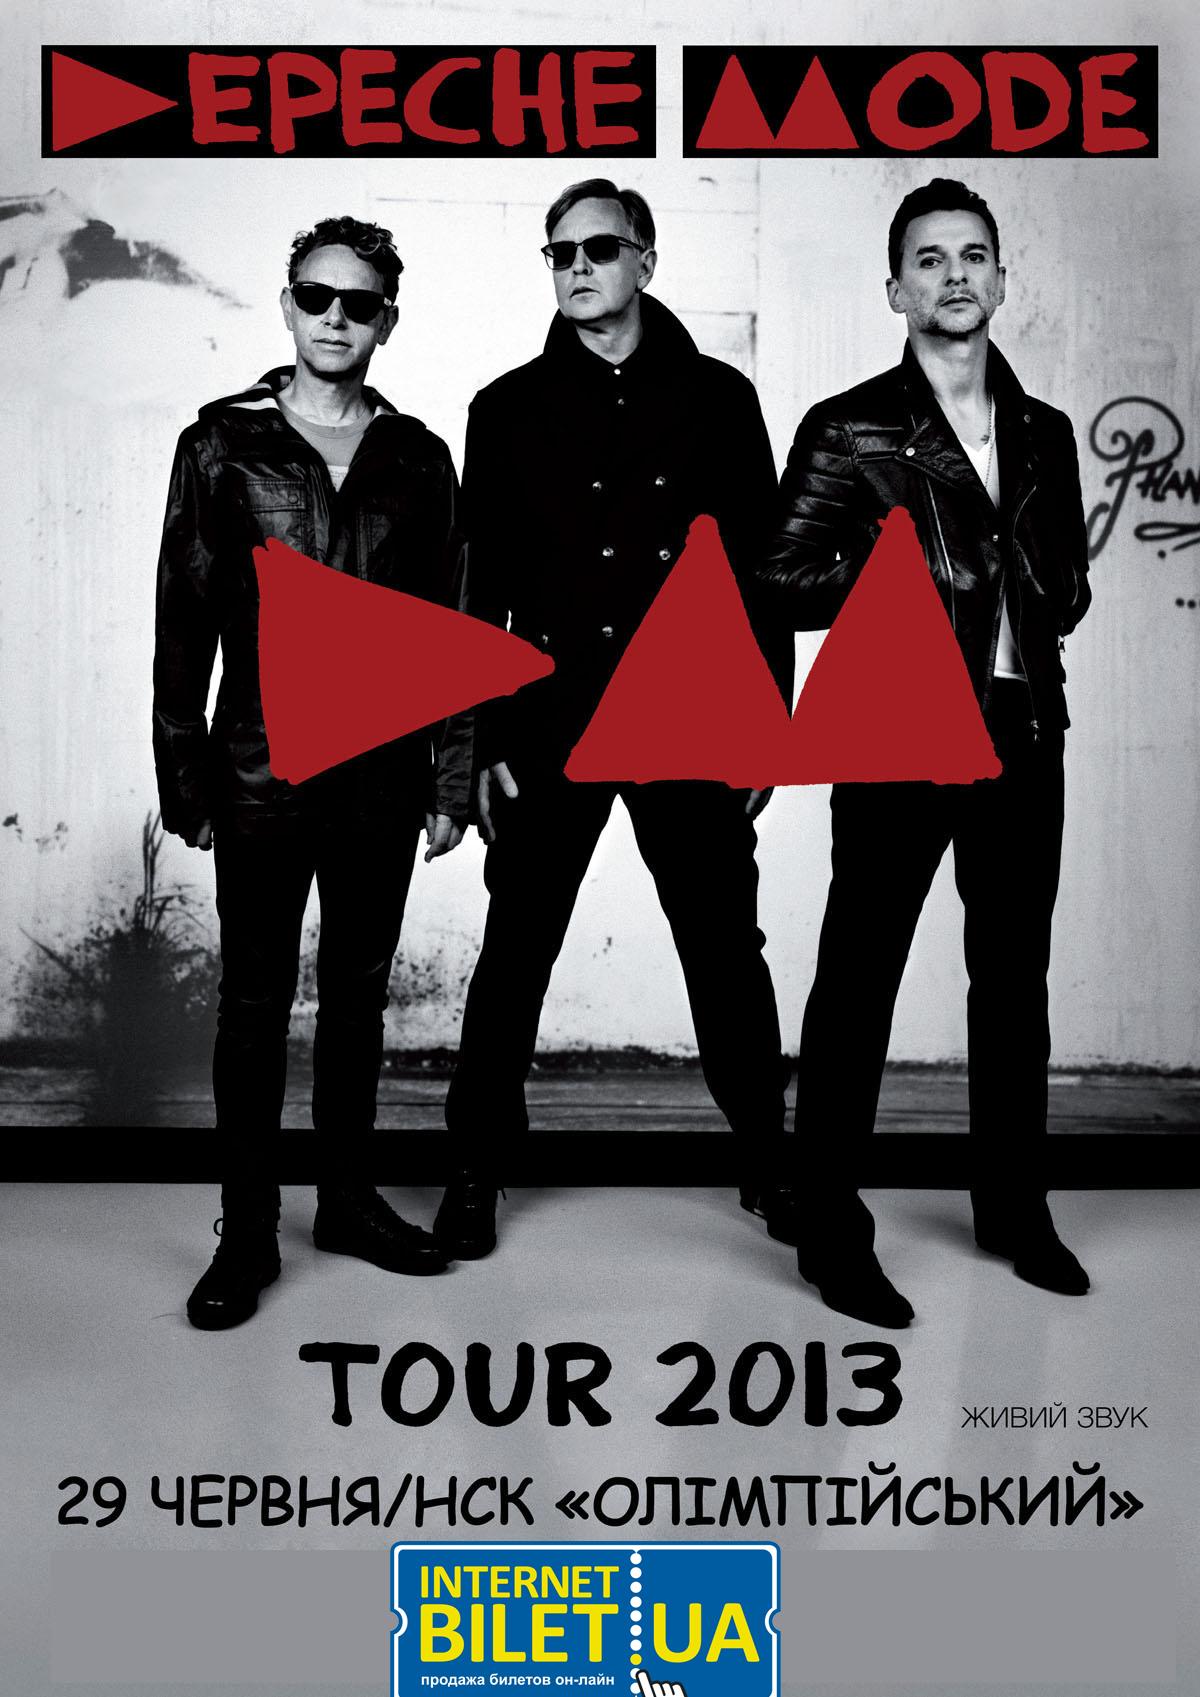 Концерт depeche mode билеты цена летний театр на вднх афиша 2017